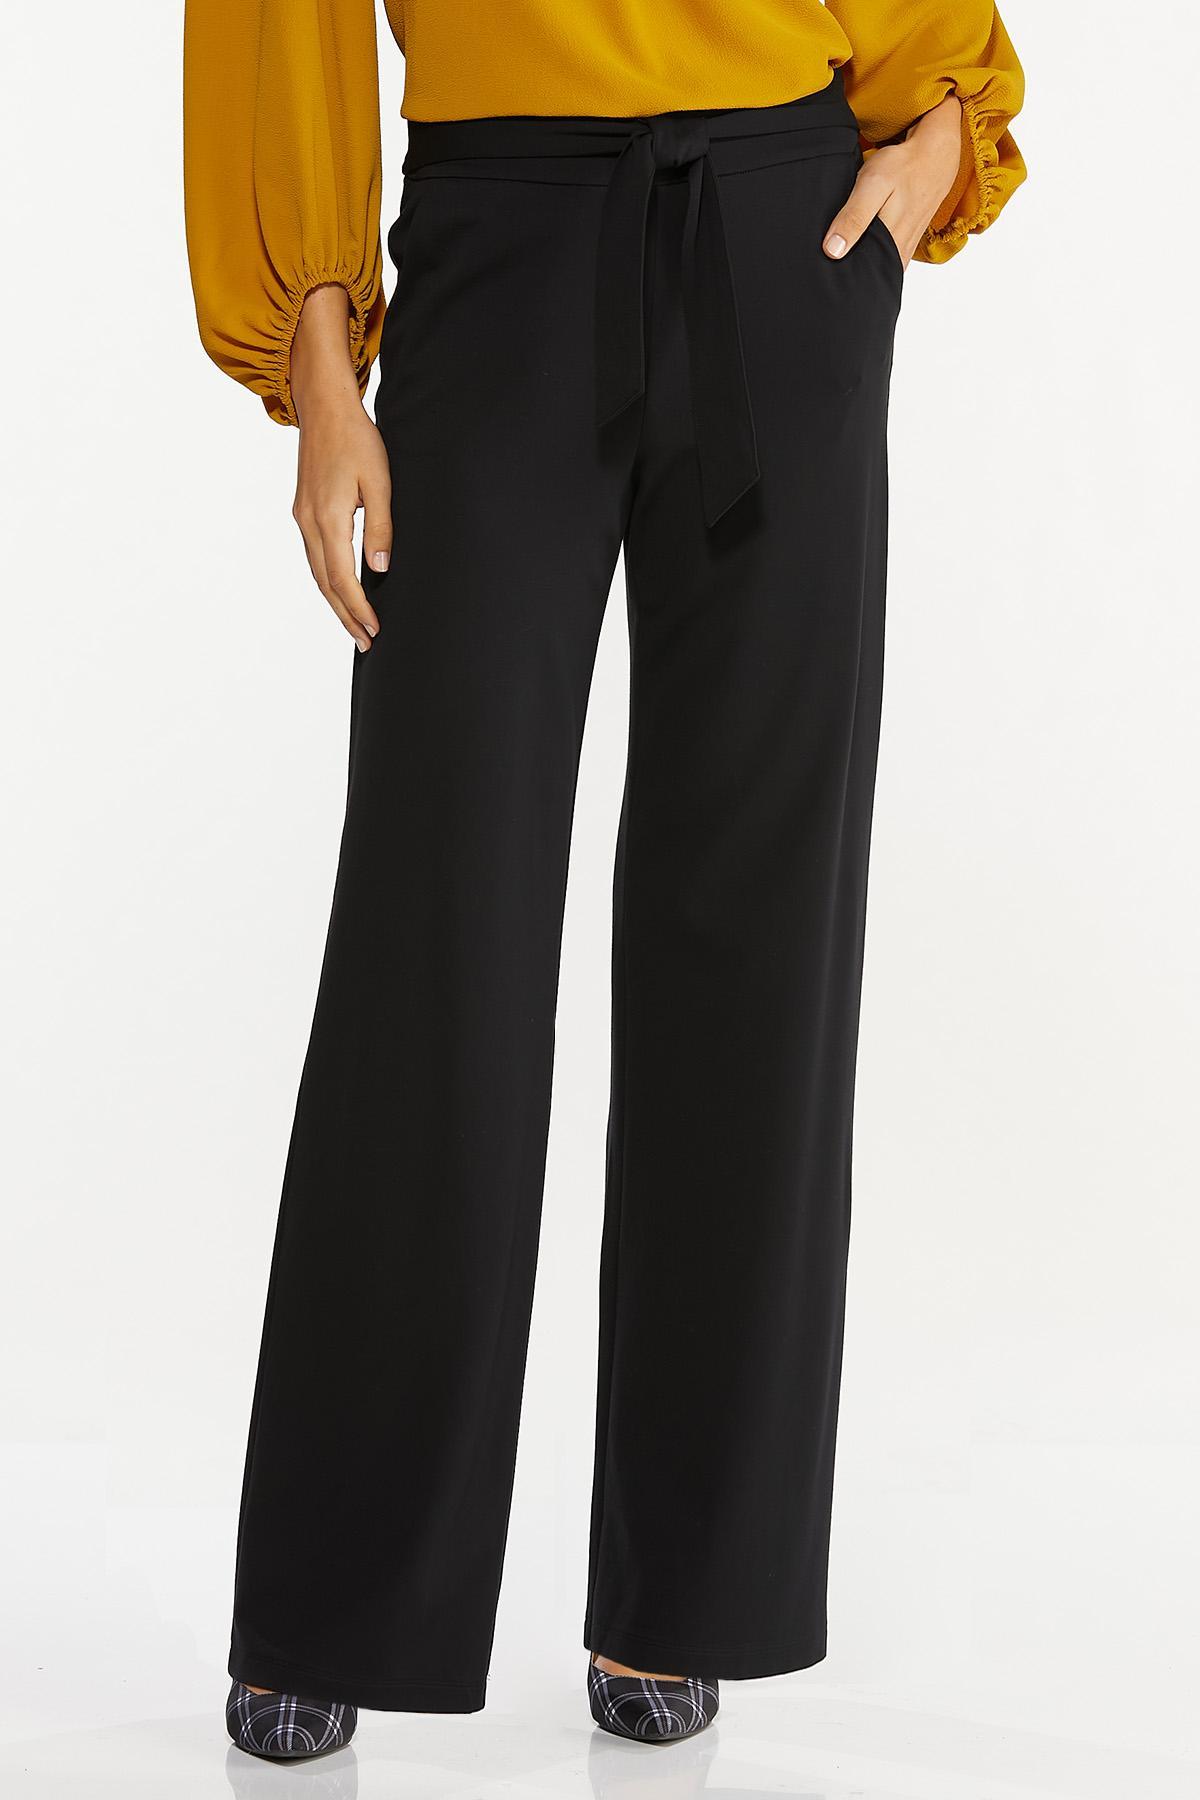 Petite Tie Waist Ponte Pants